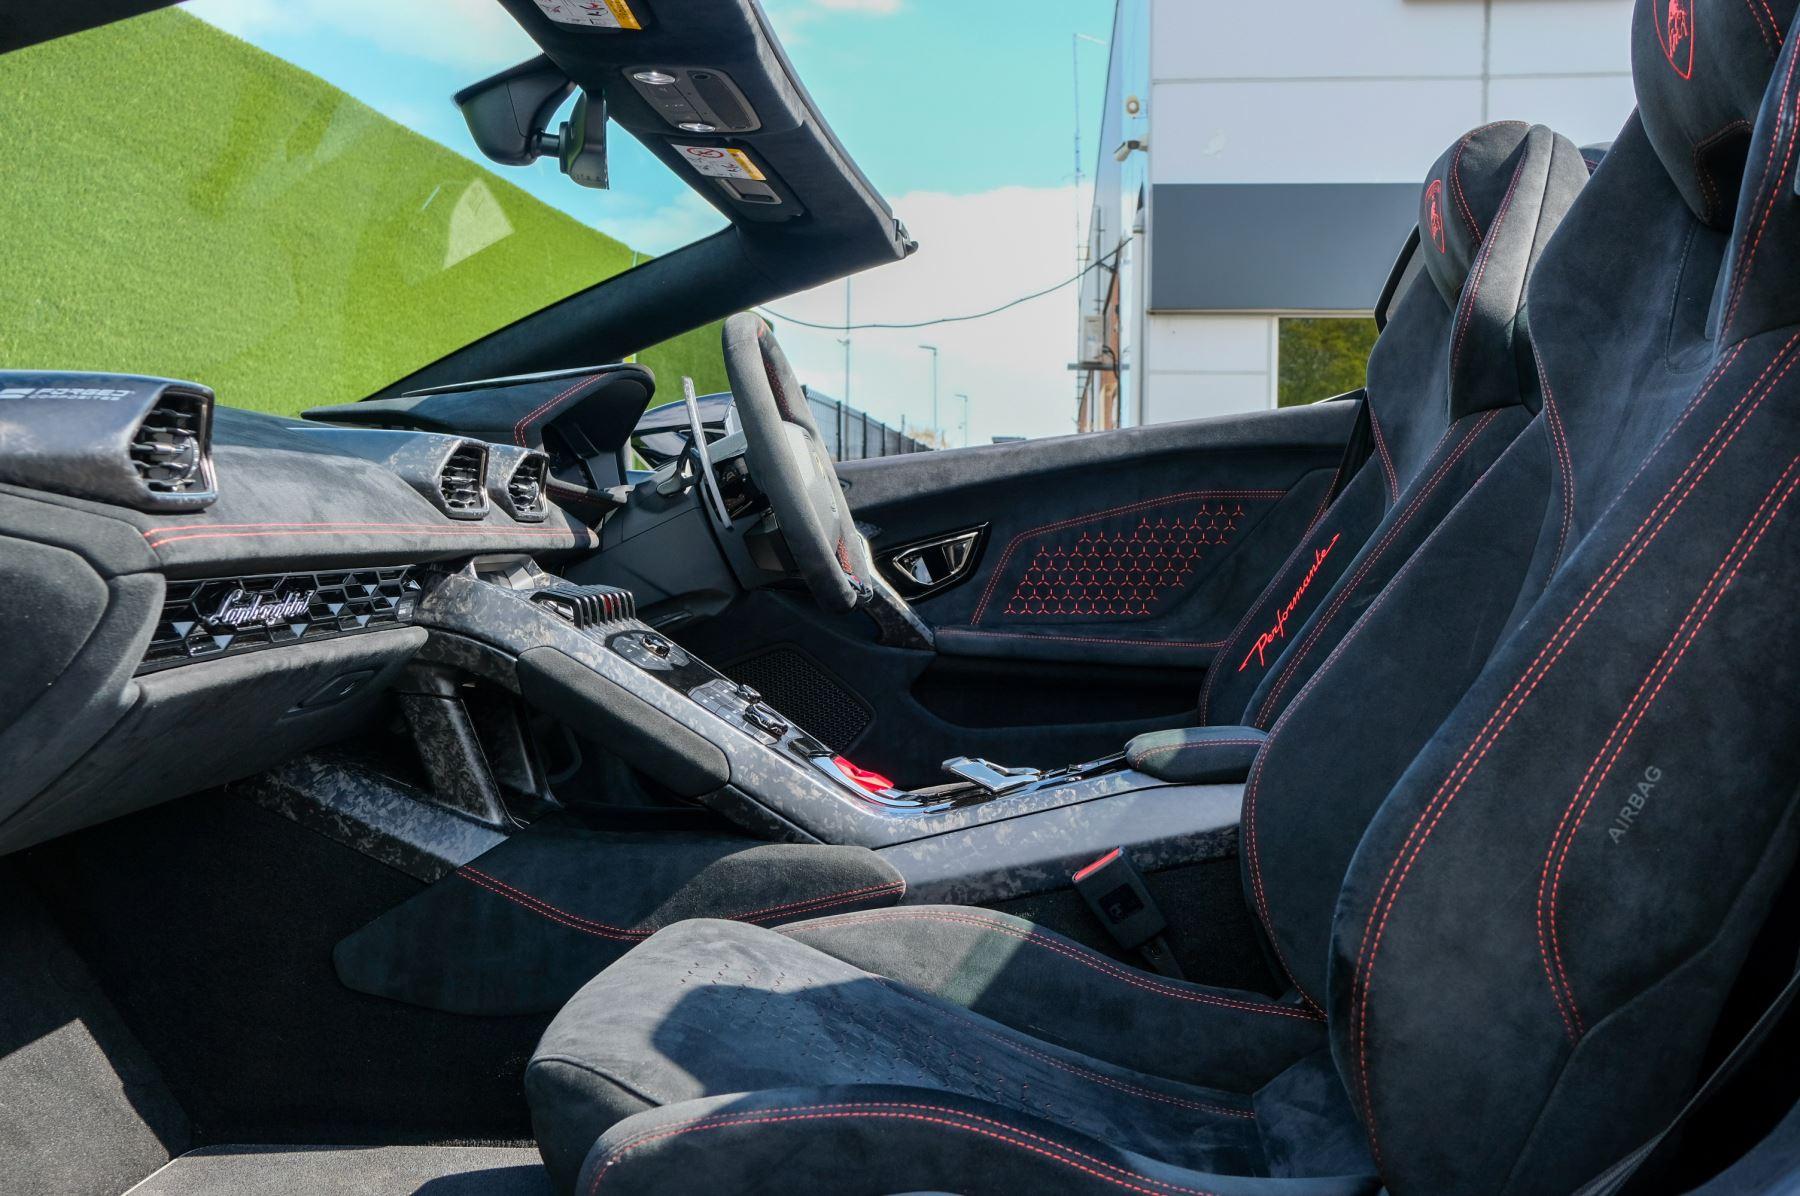 Lamborghini Huracan Performante Spyder 5.2 V10 AWD image 6